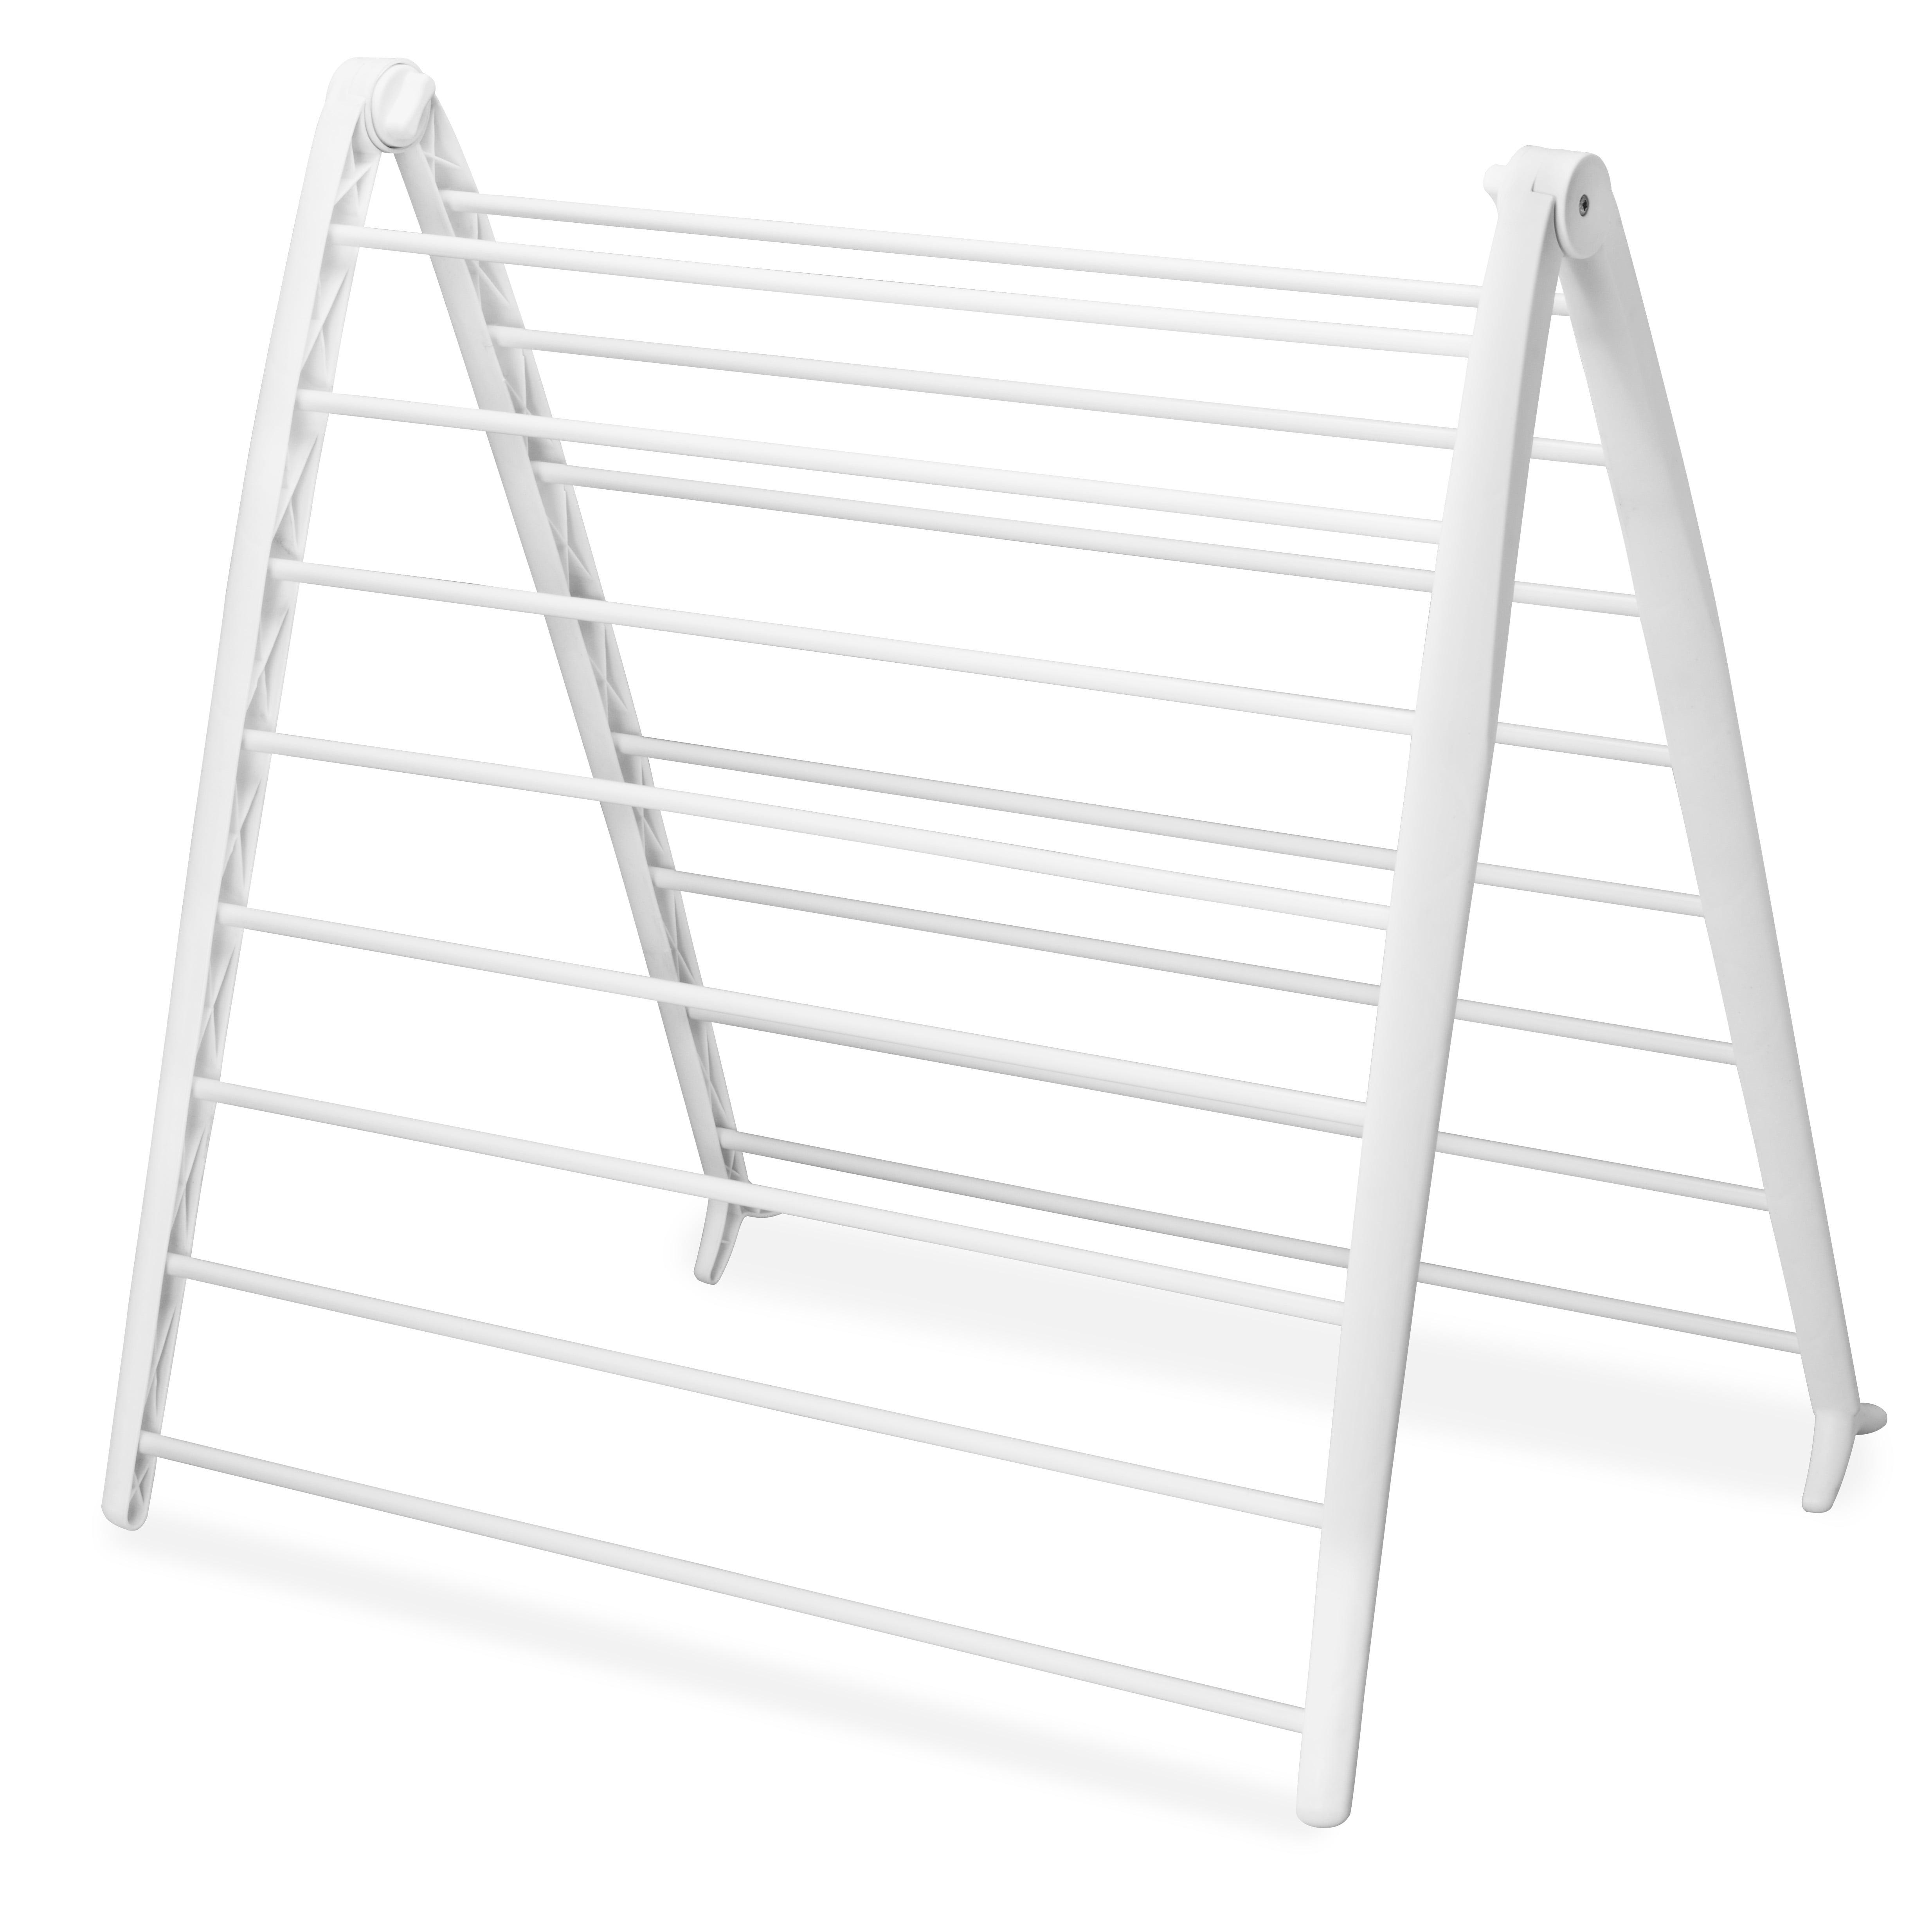 mainstays space saving folding drying rack white walmart com walmart com